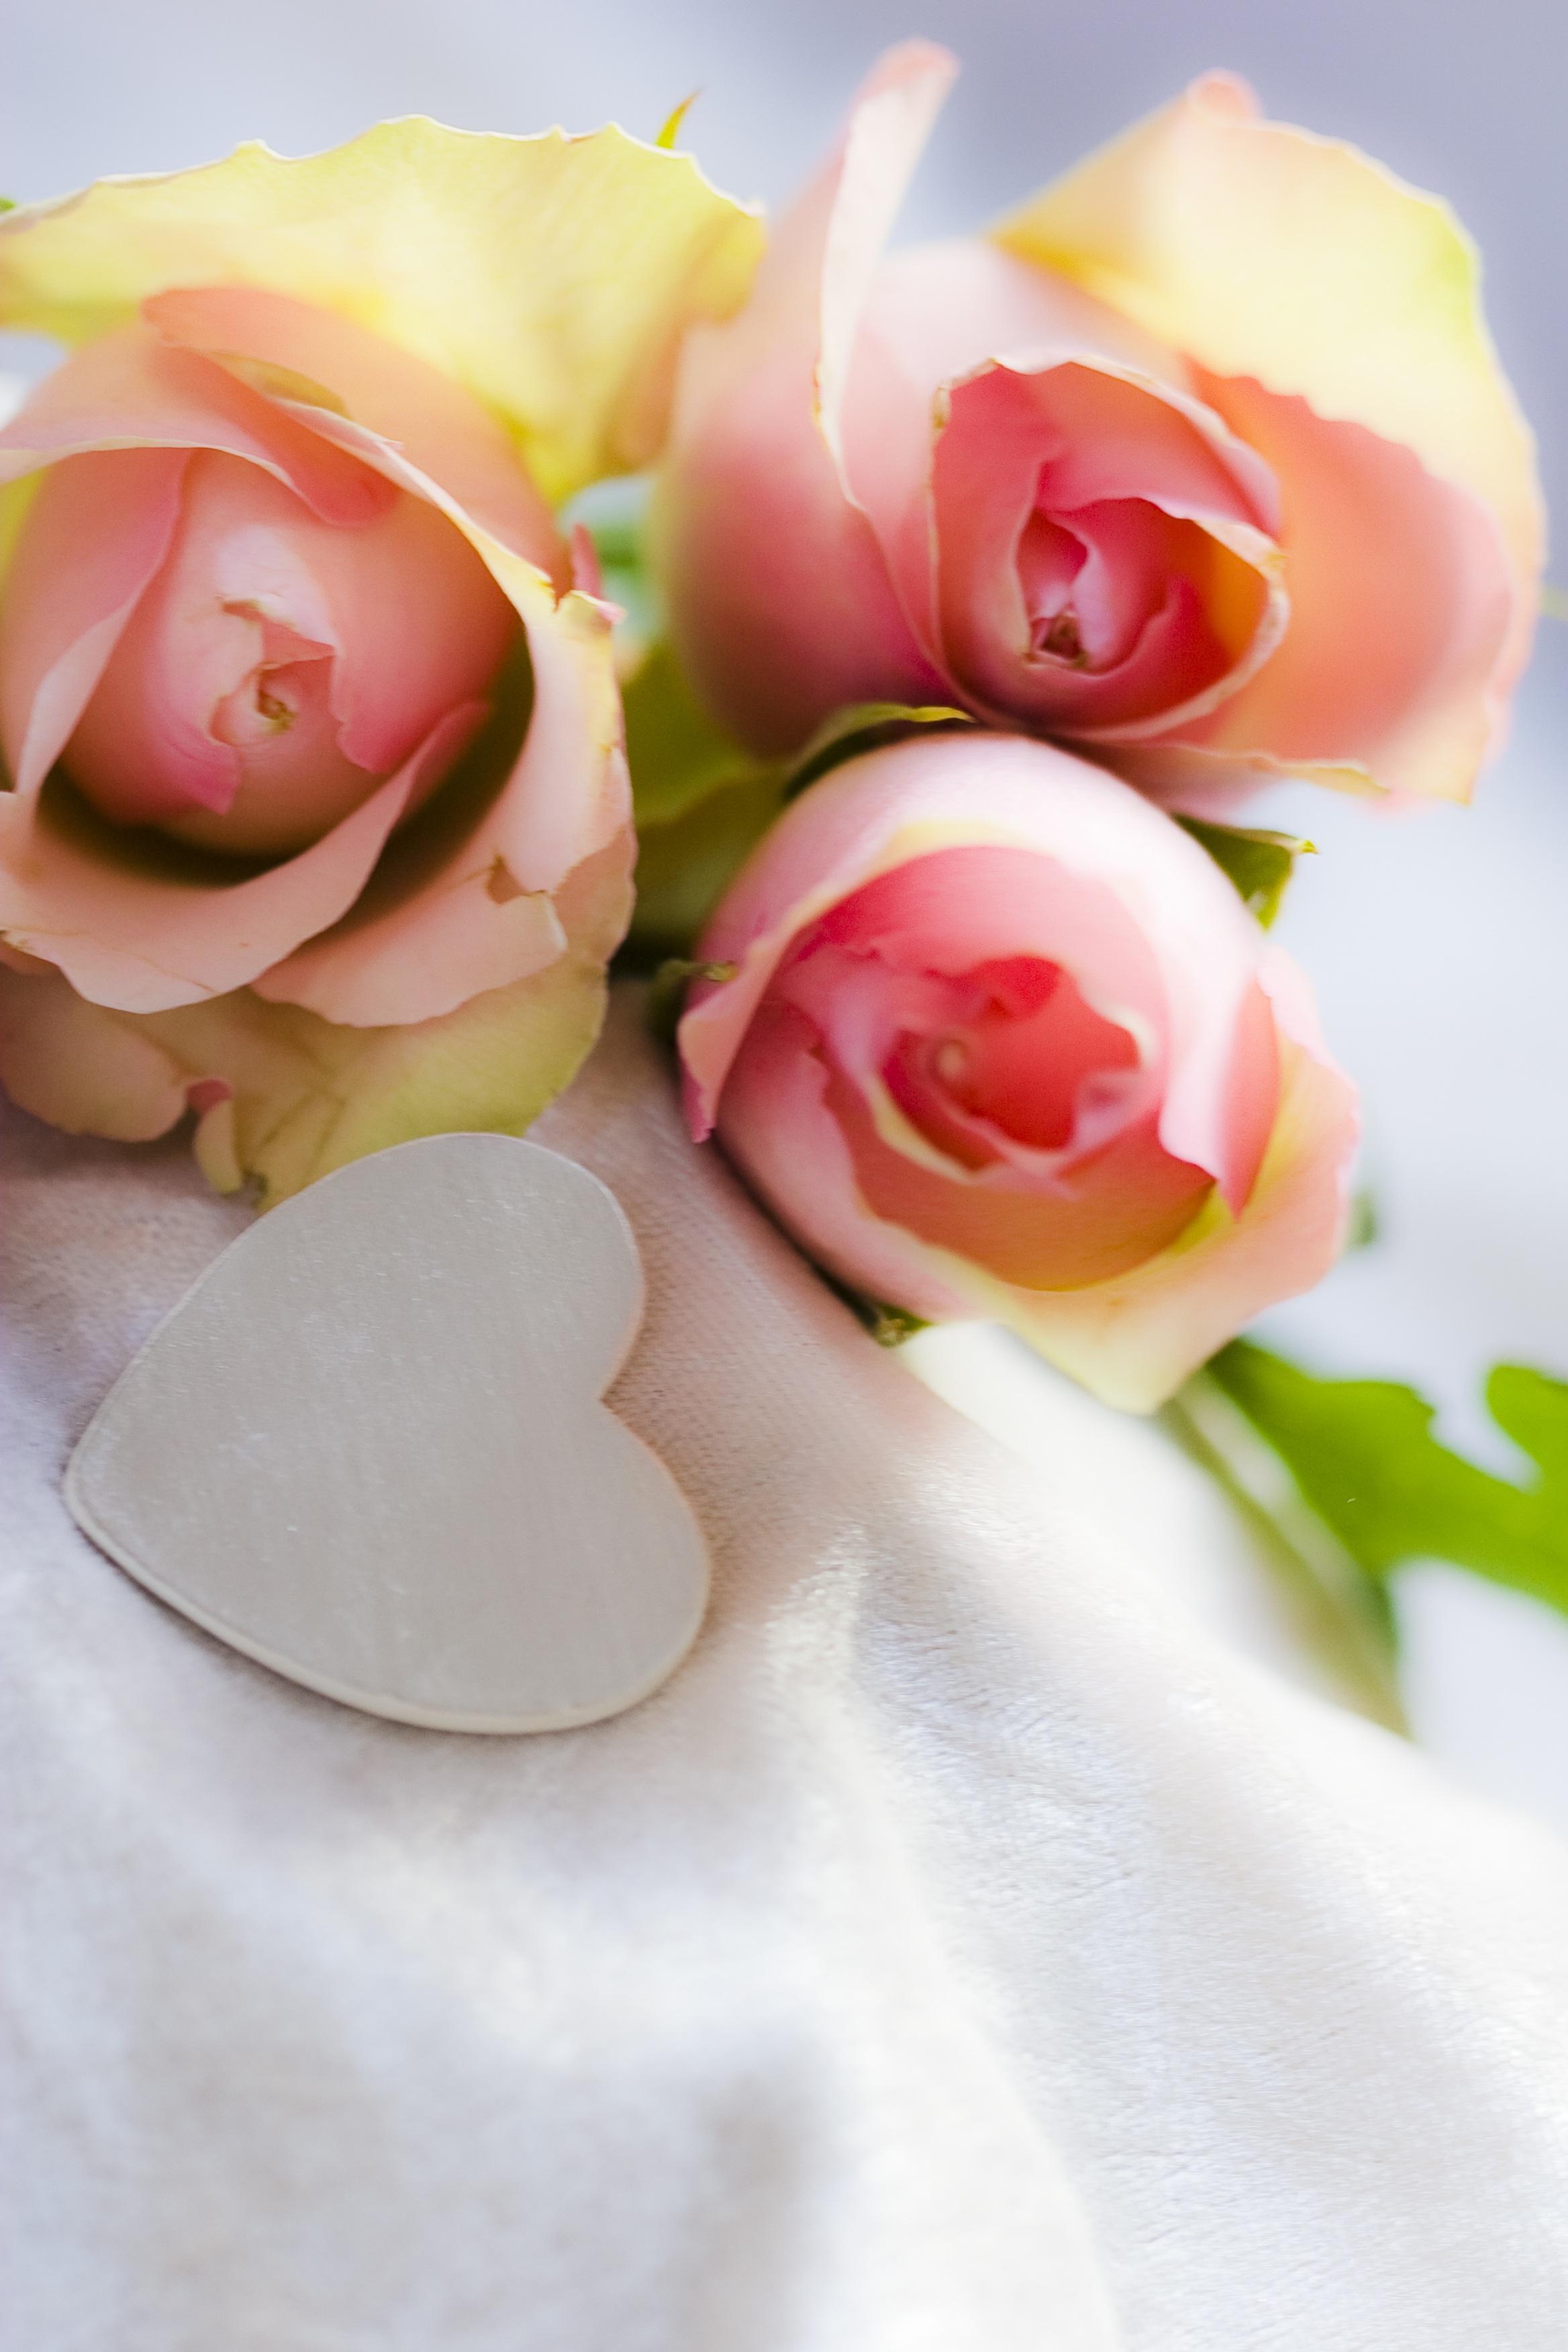 Free Images Blossom White Petal Bloom Heart Rose Food